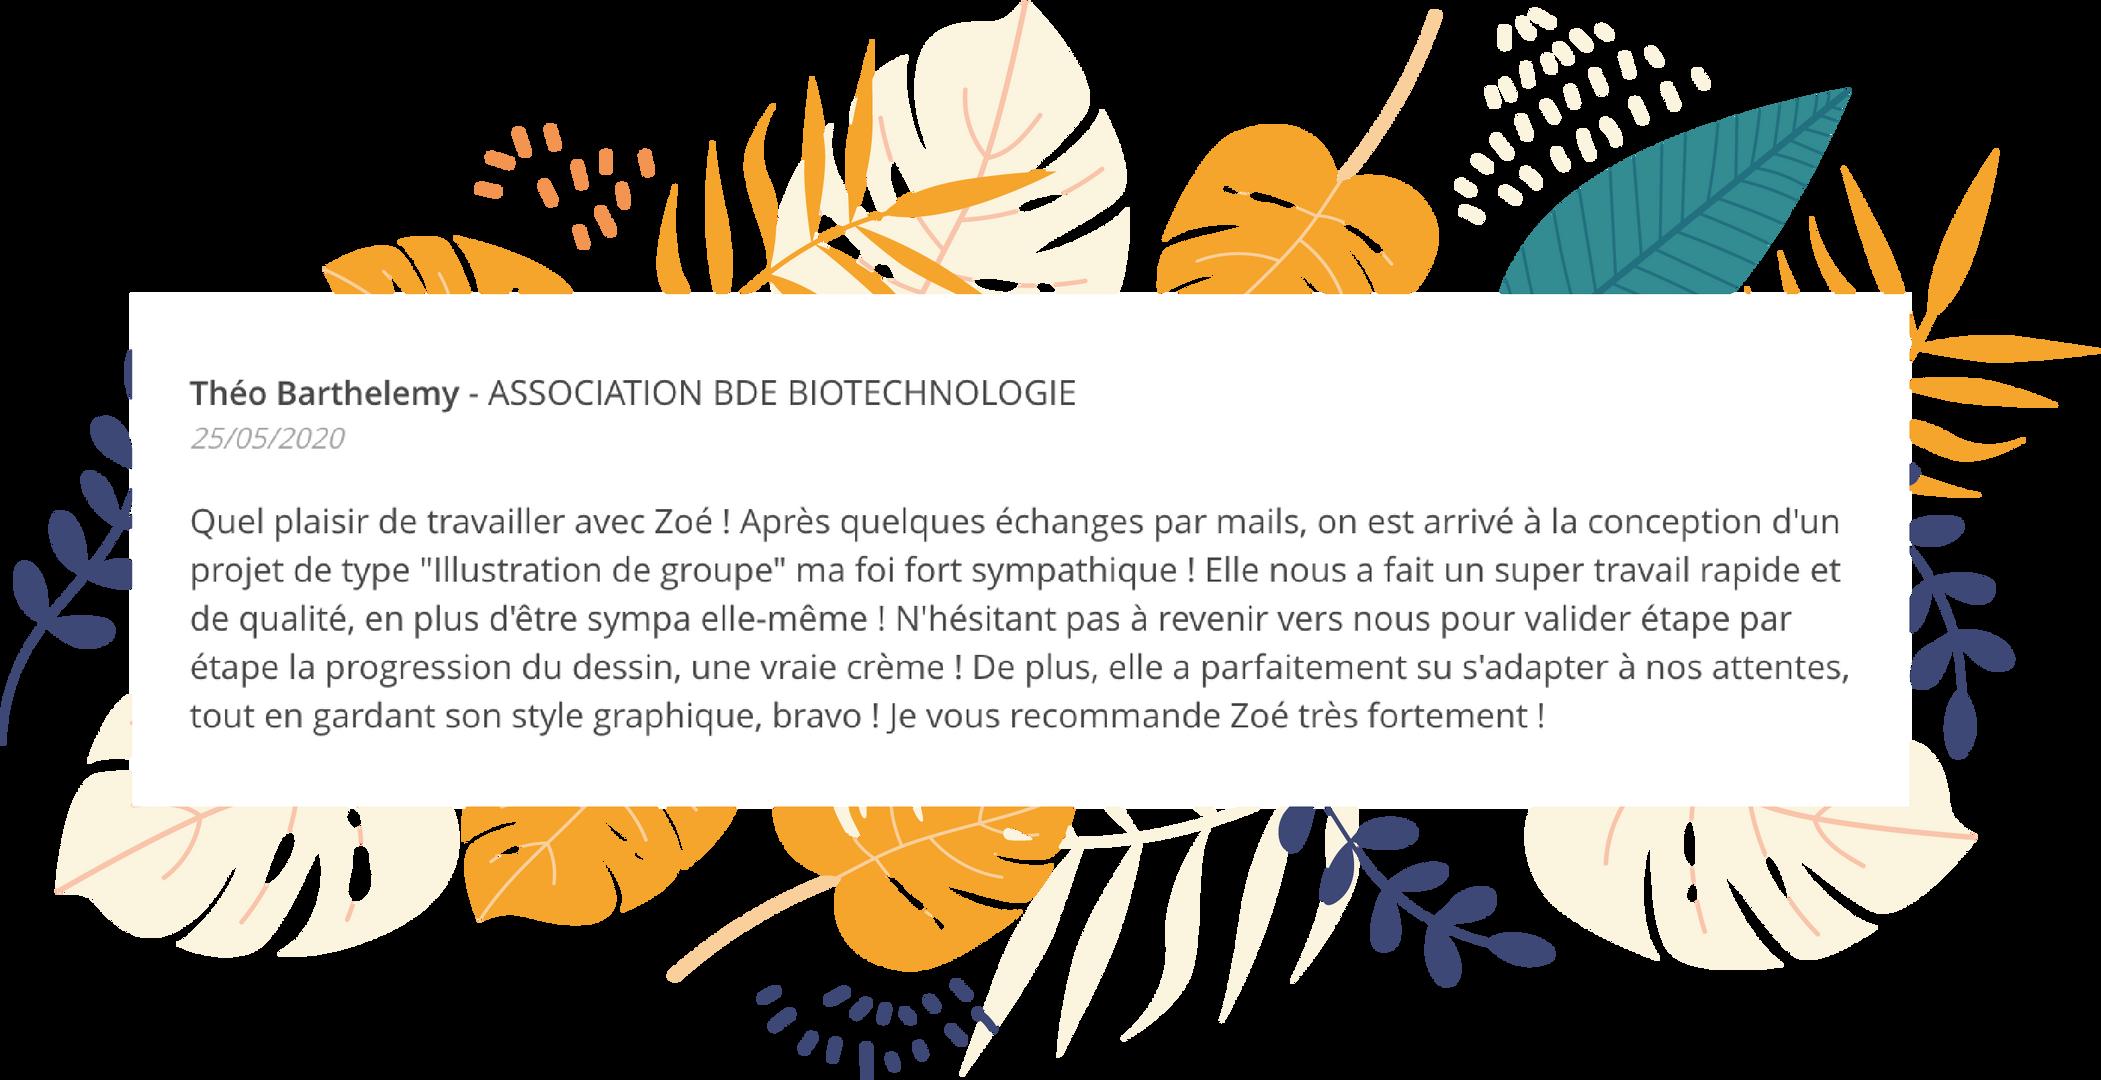 AVIS THEO - ASSOCIATION BDE BIOTECHNOLOG